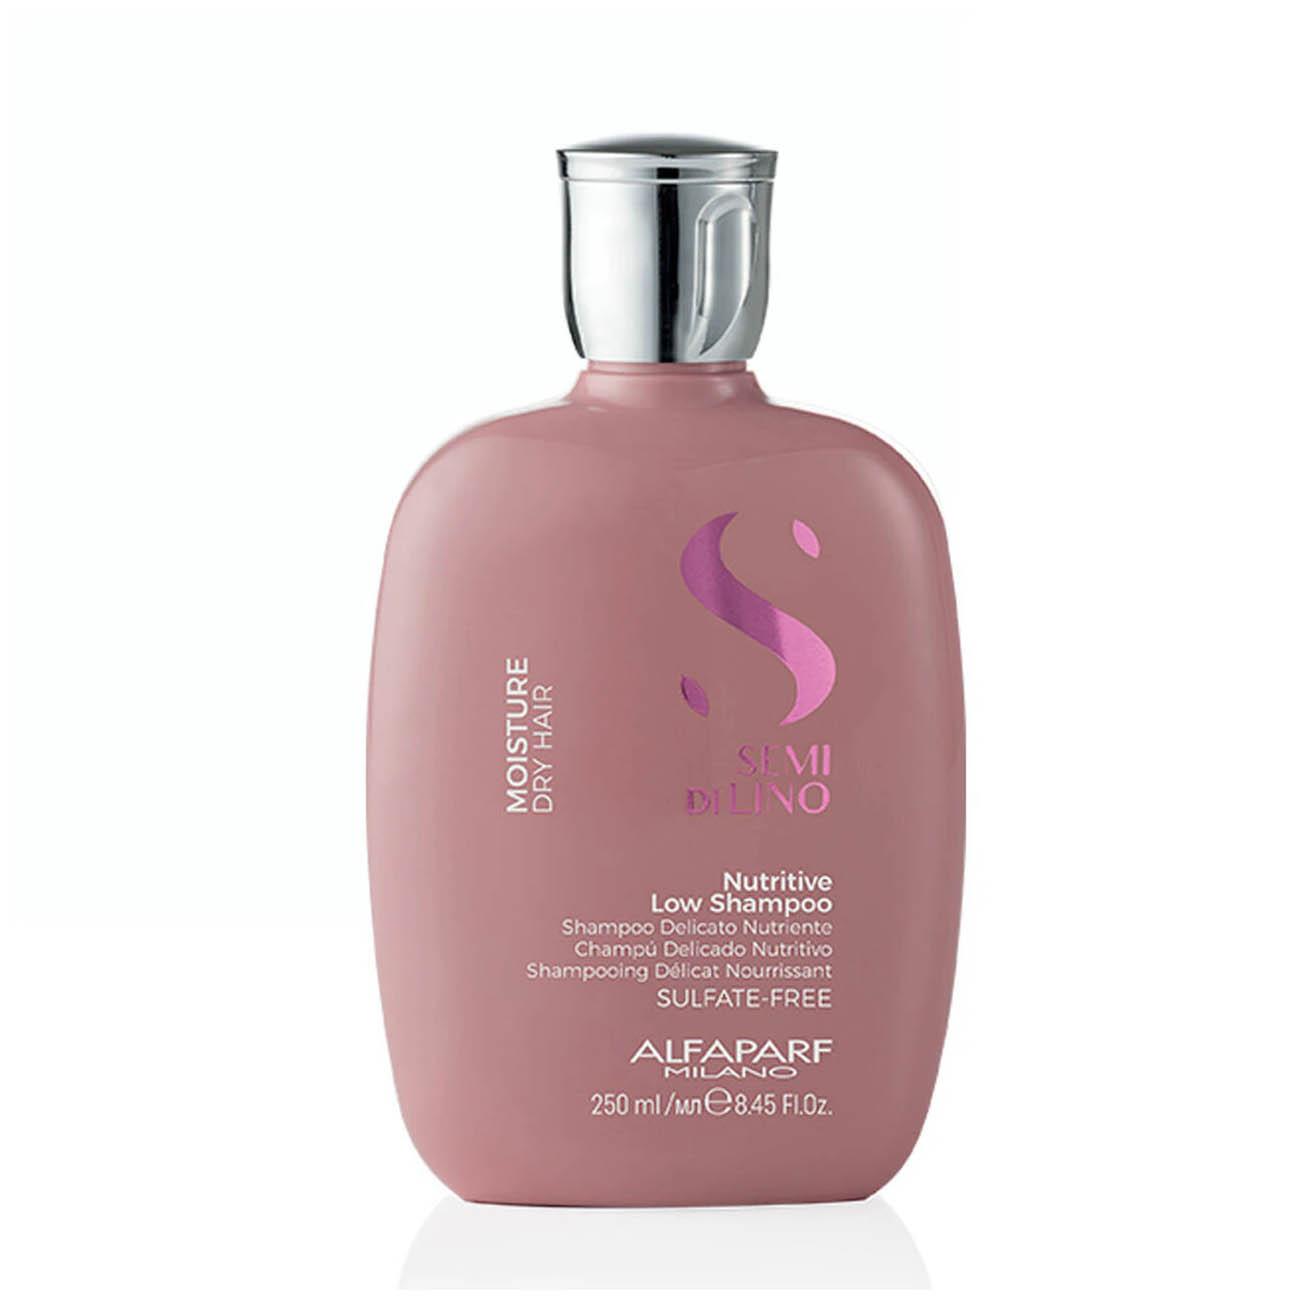 Alfaparf Milano Semi Di LINO Moisture Dry Hair Nutritive Low Shampoo 250ml/8.45fl.oz